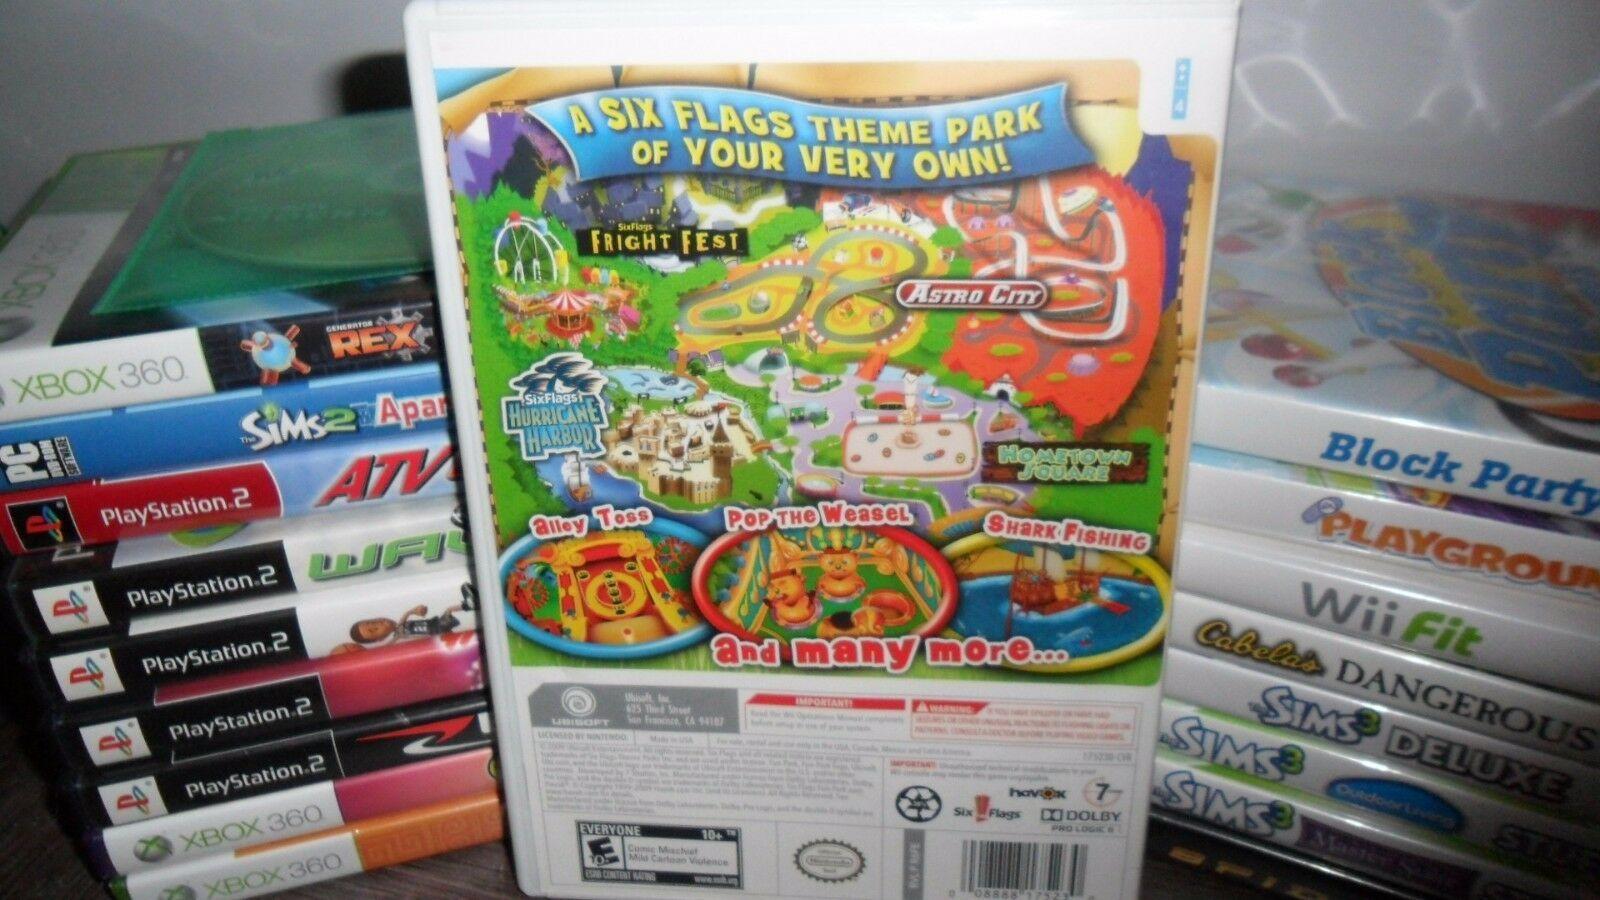 Six Flags Fun Park (Nintendo Wii, 2009)